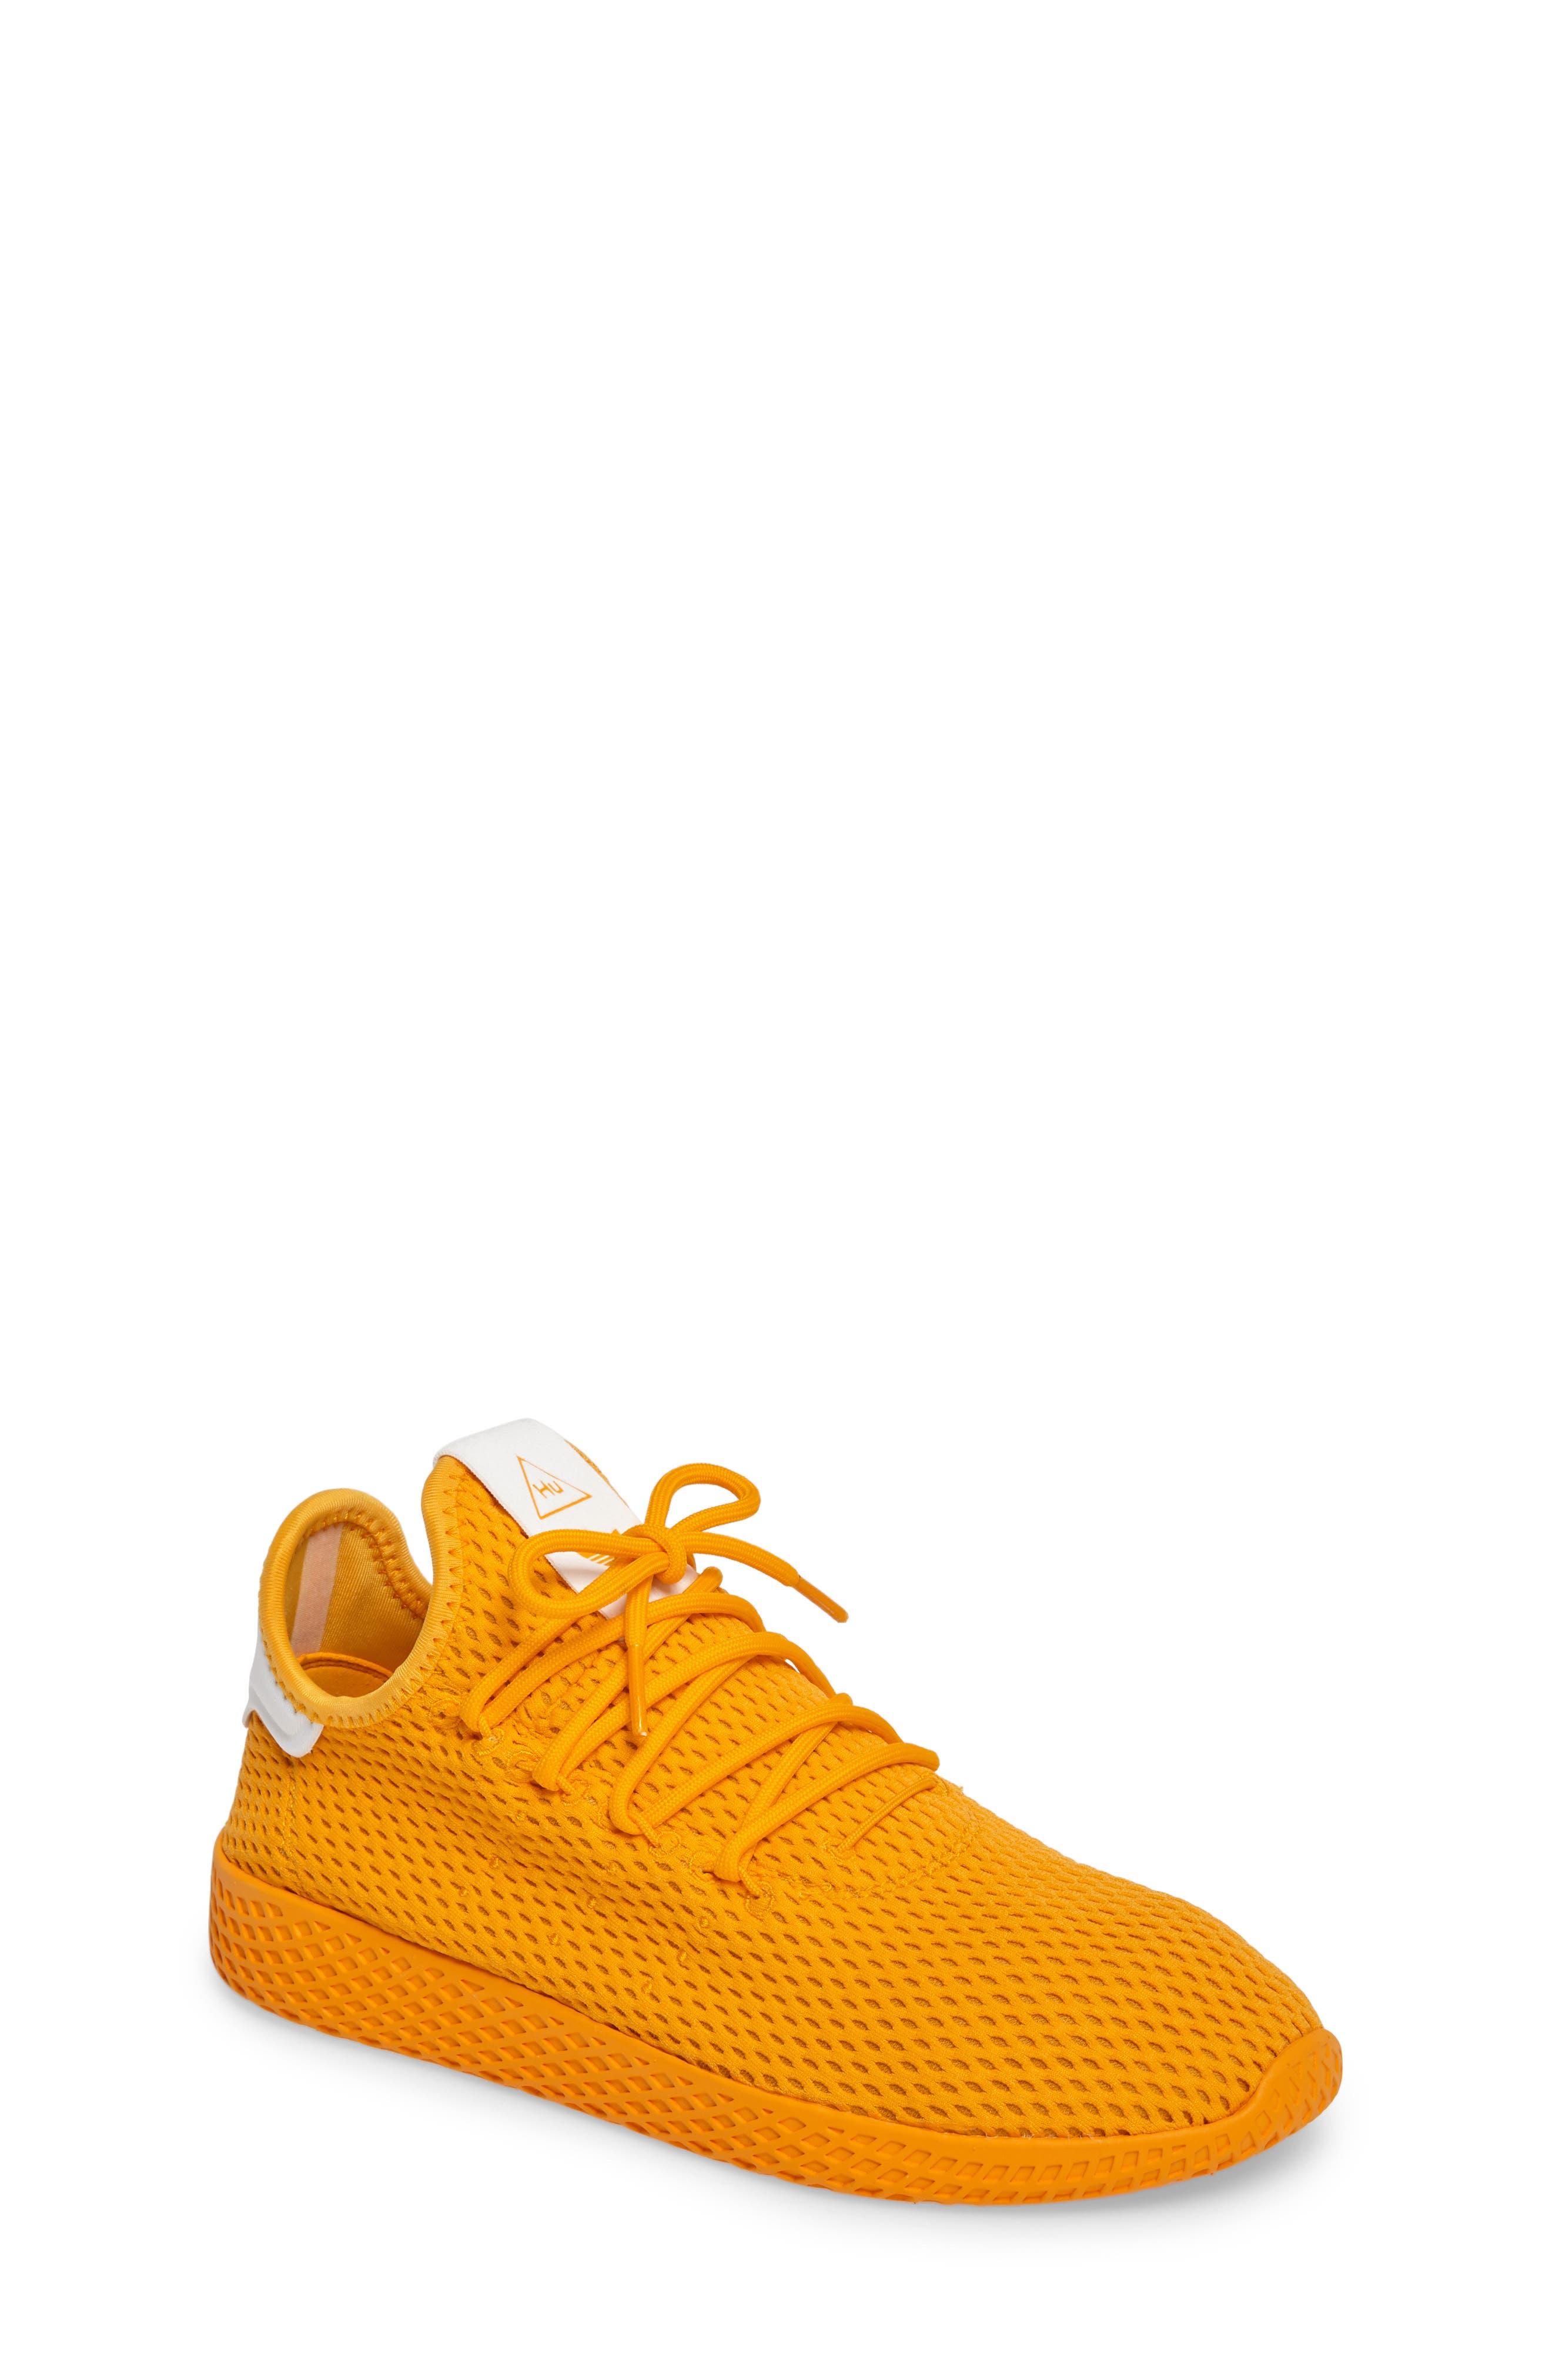 Main Image - adidas Originals x Pharrell Williams The Summers Mesh Sneaker (Big Kid)